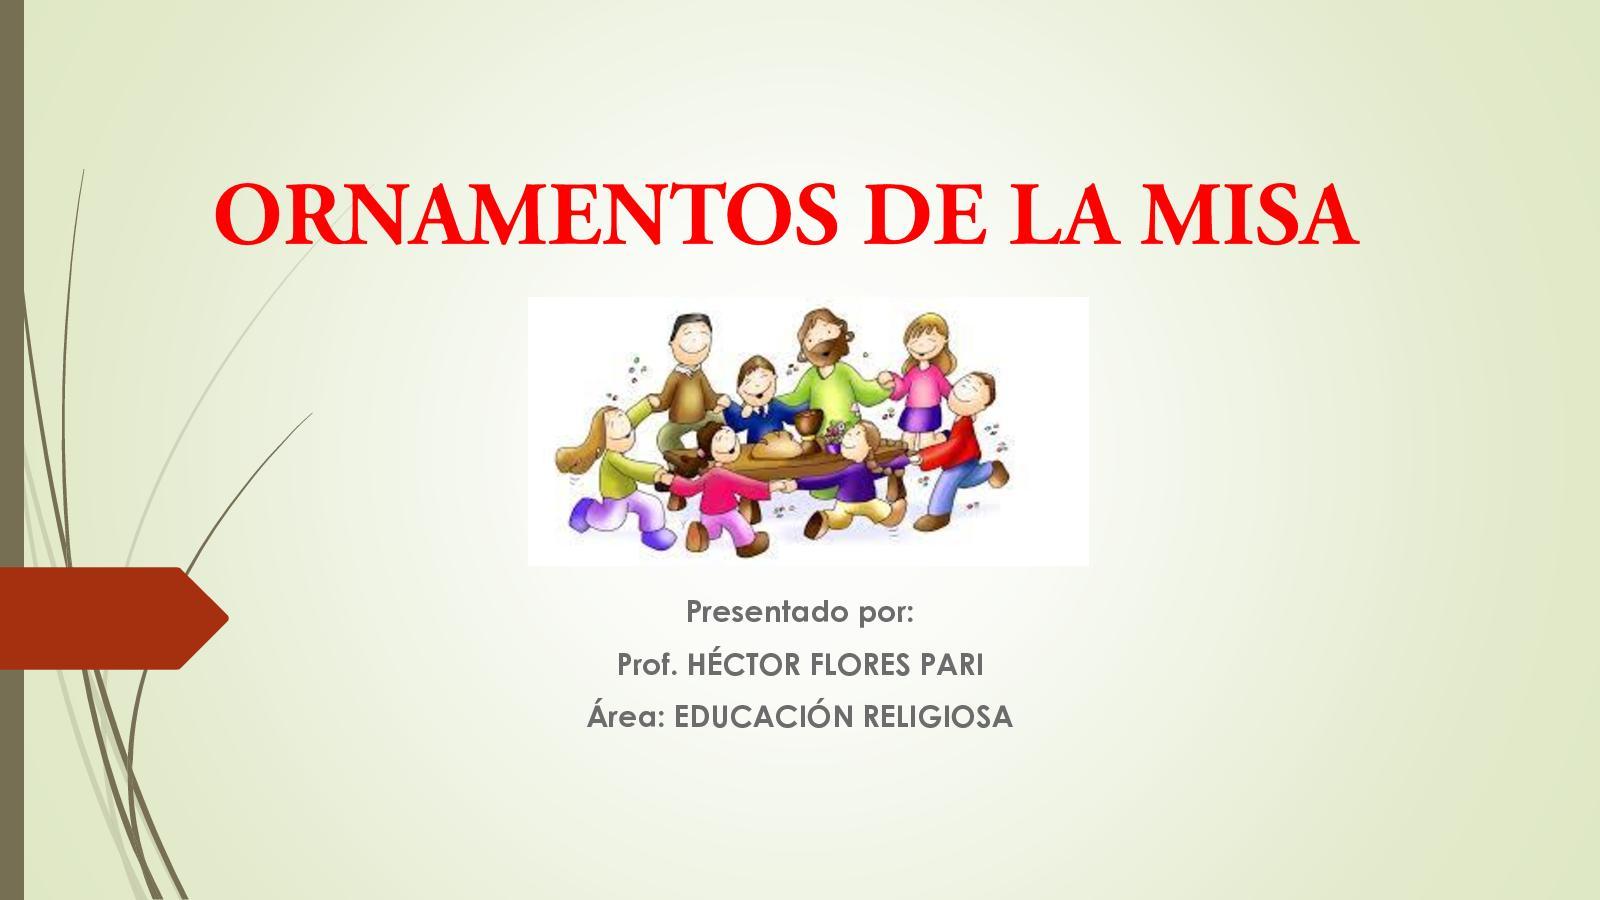 Calaméo Hector Flores Pari 290365 Assignsubmission File Ornamentos De La Misa 2